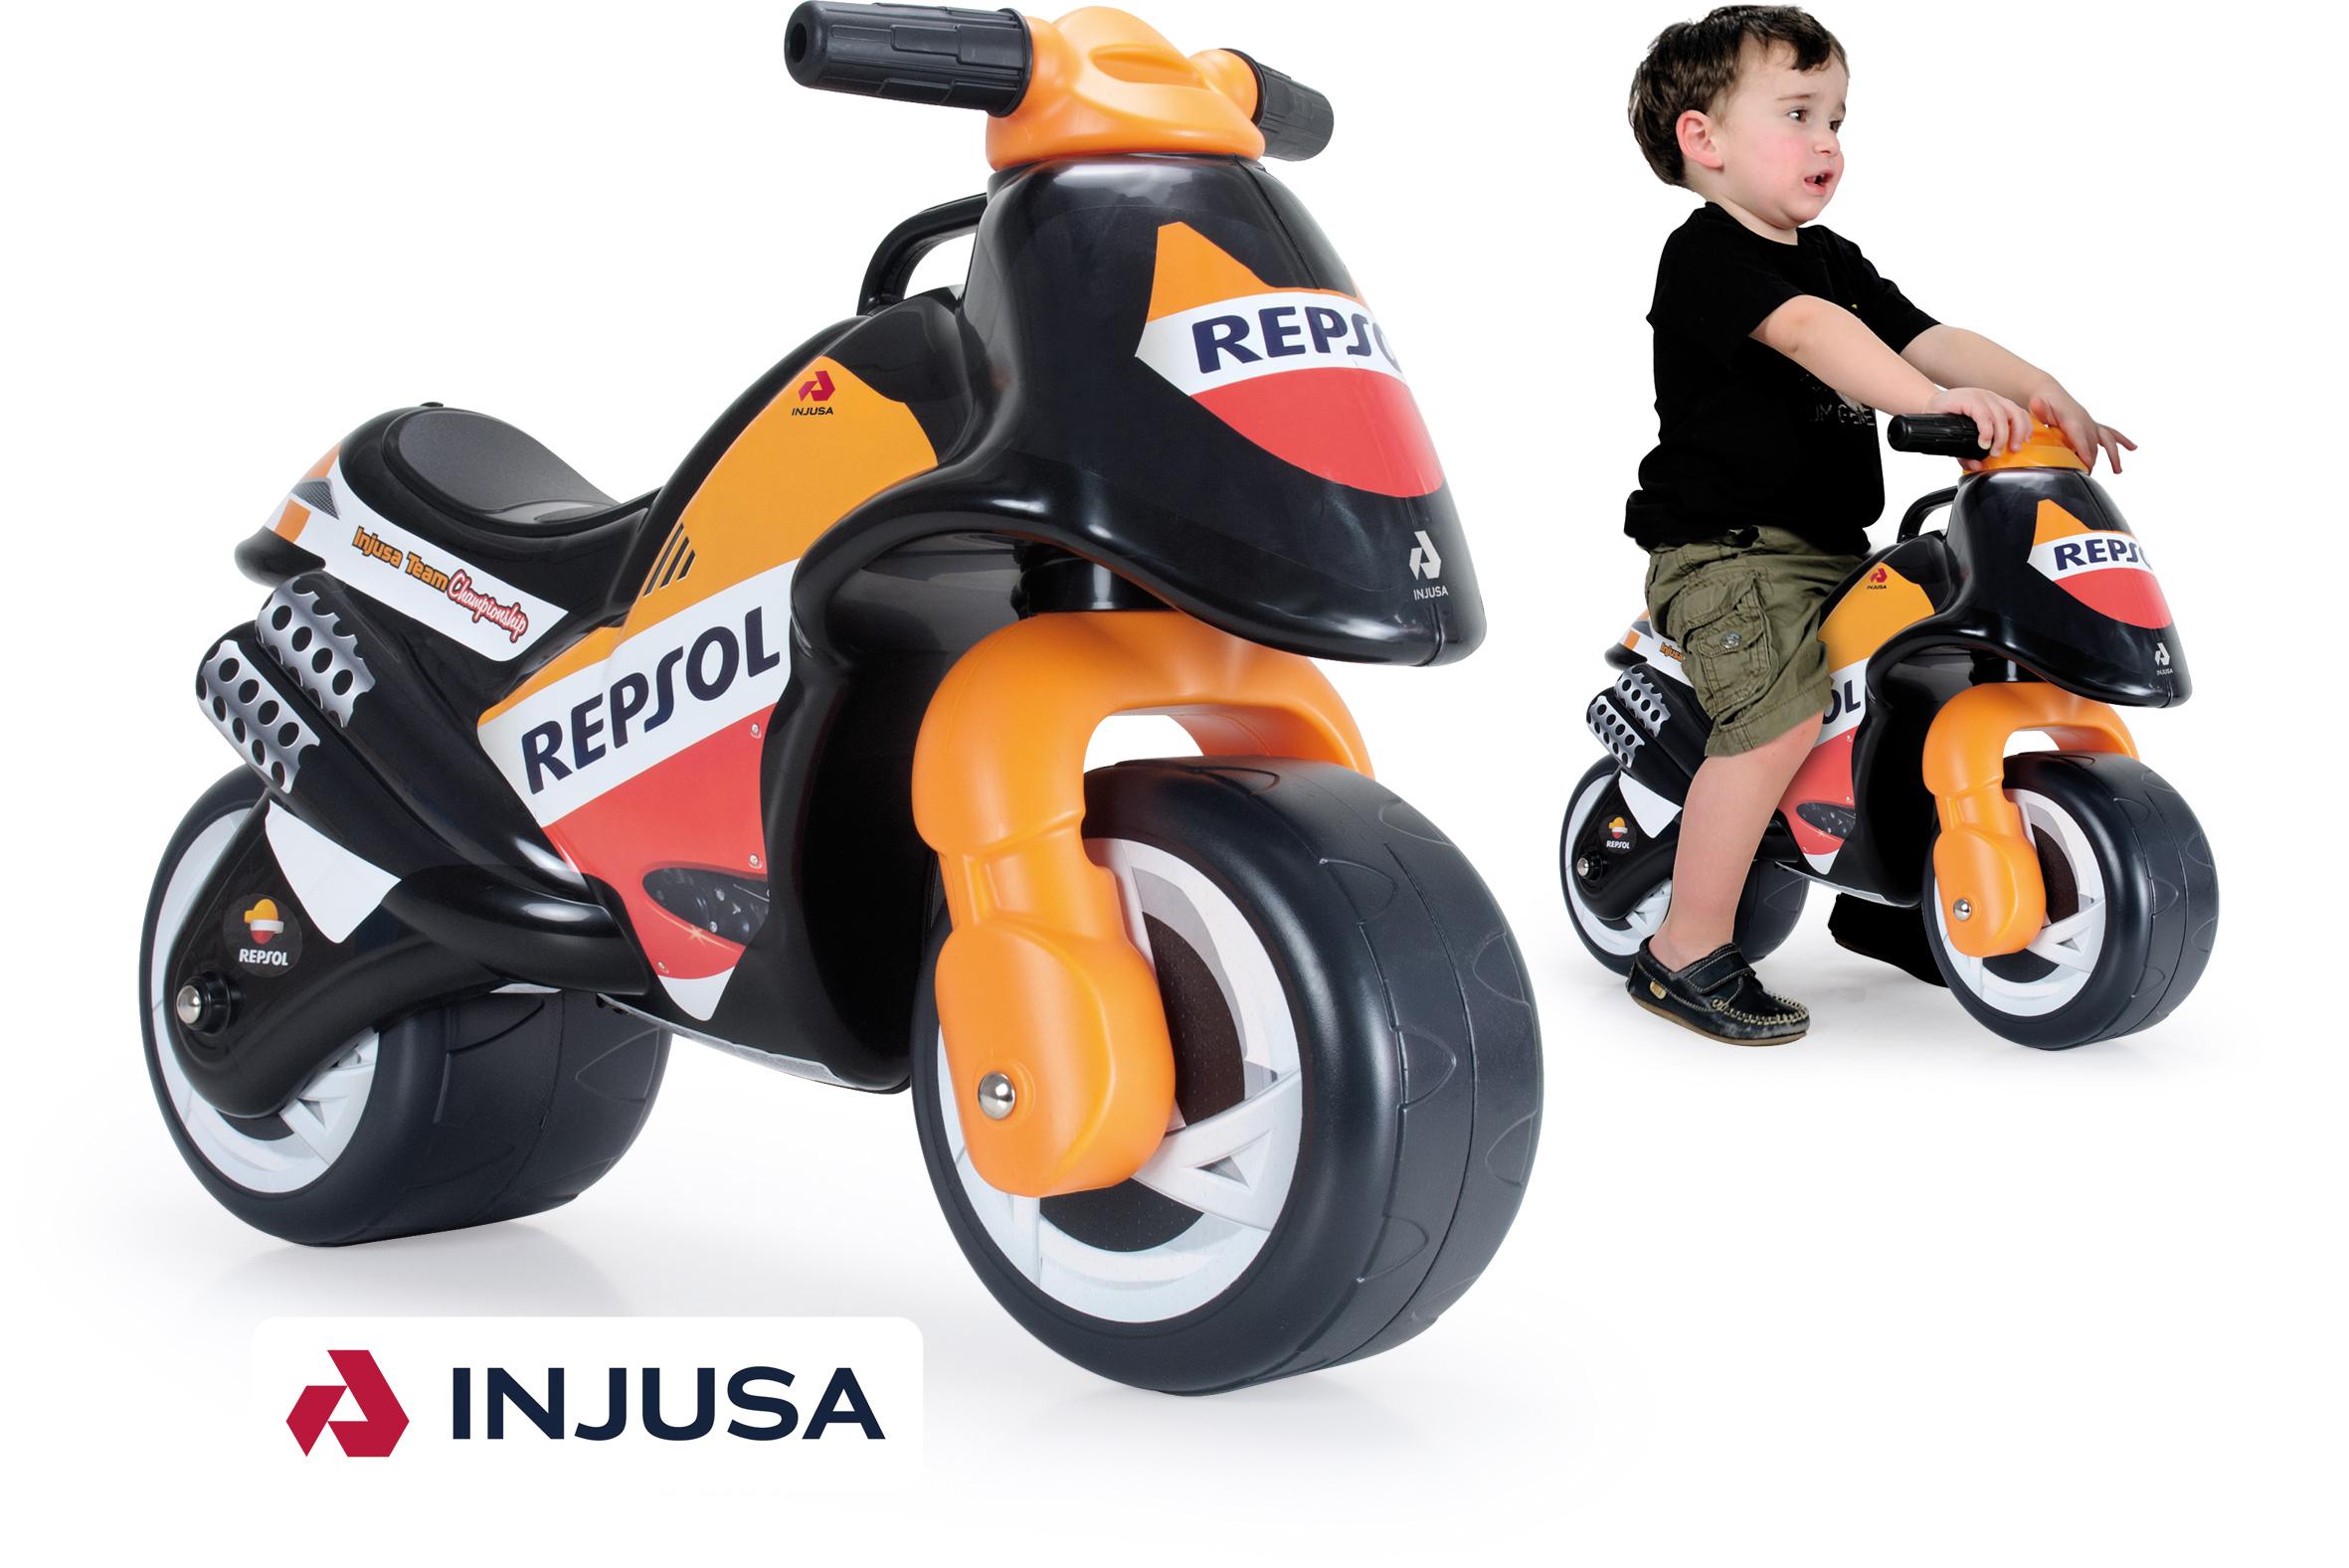 MOTO NEOX REPSOL 1901 - N58420